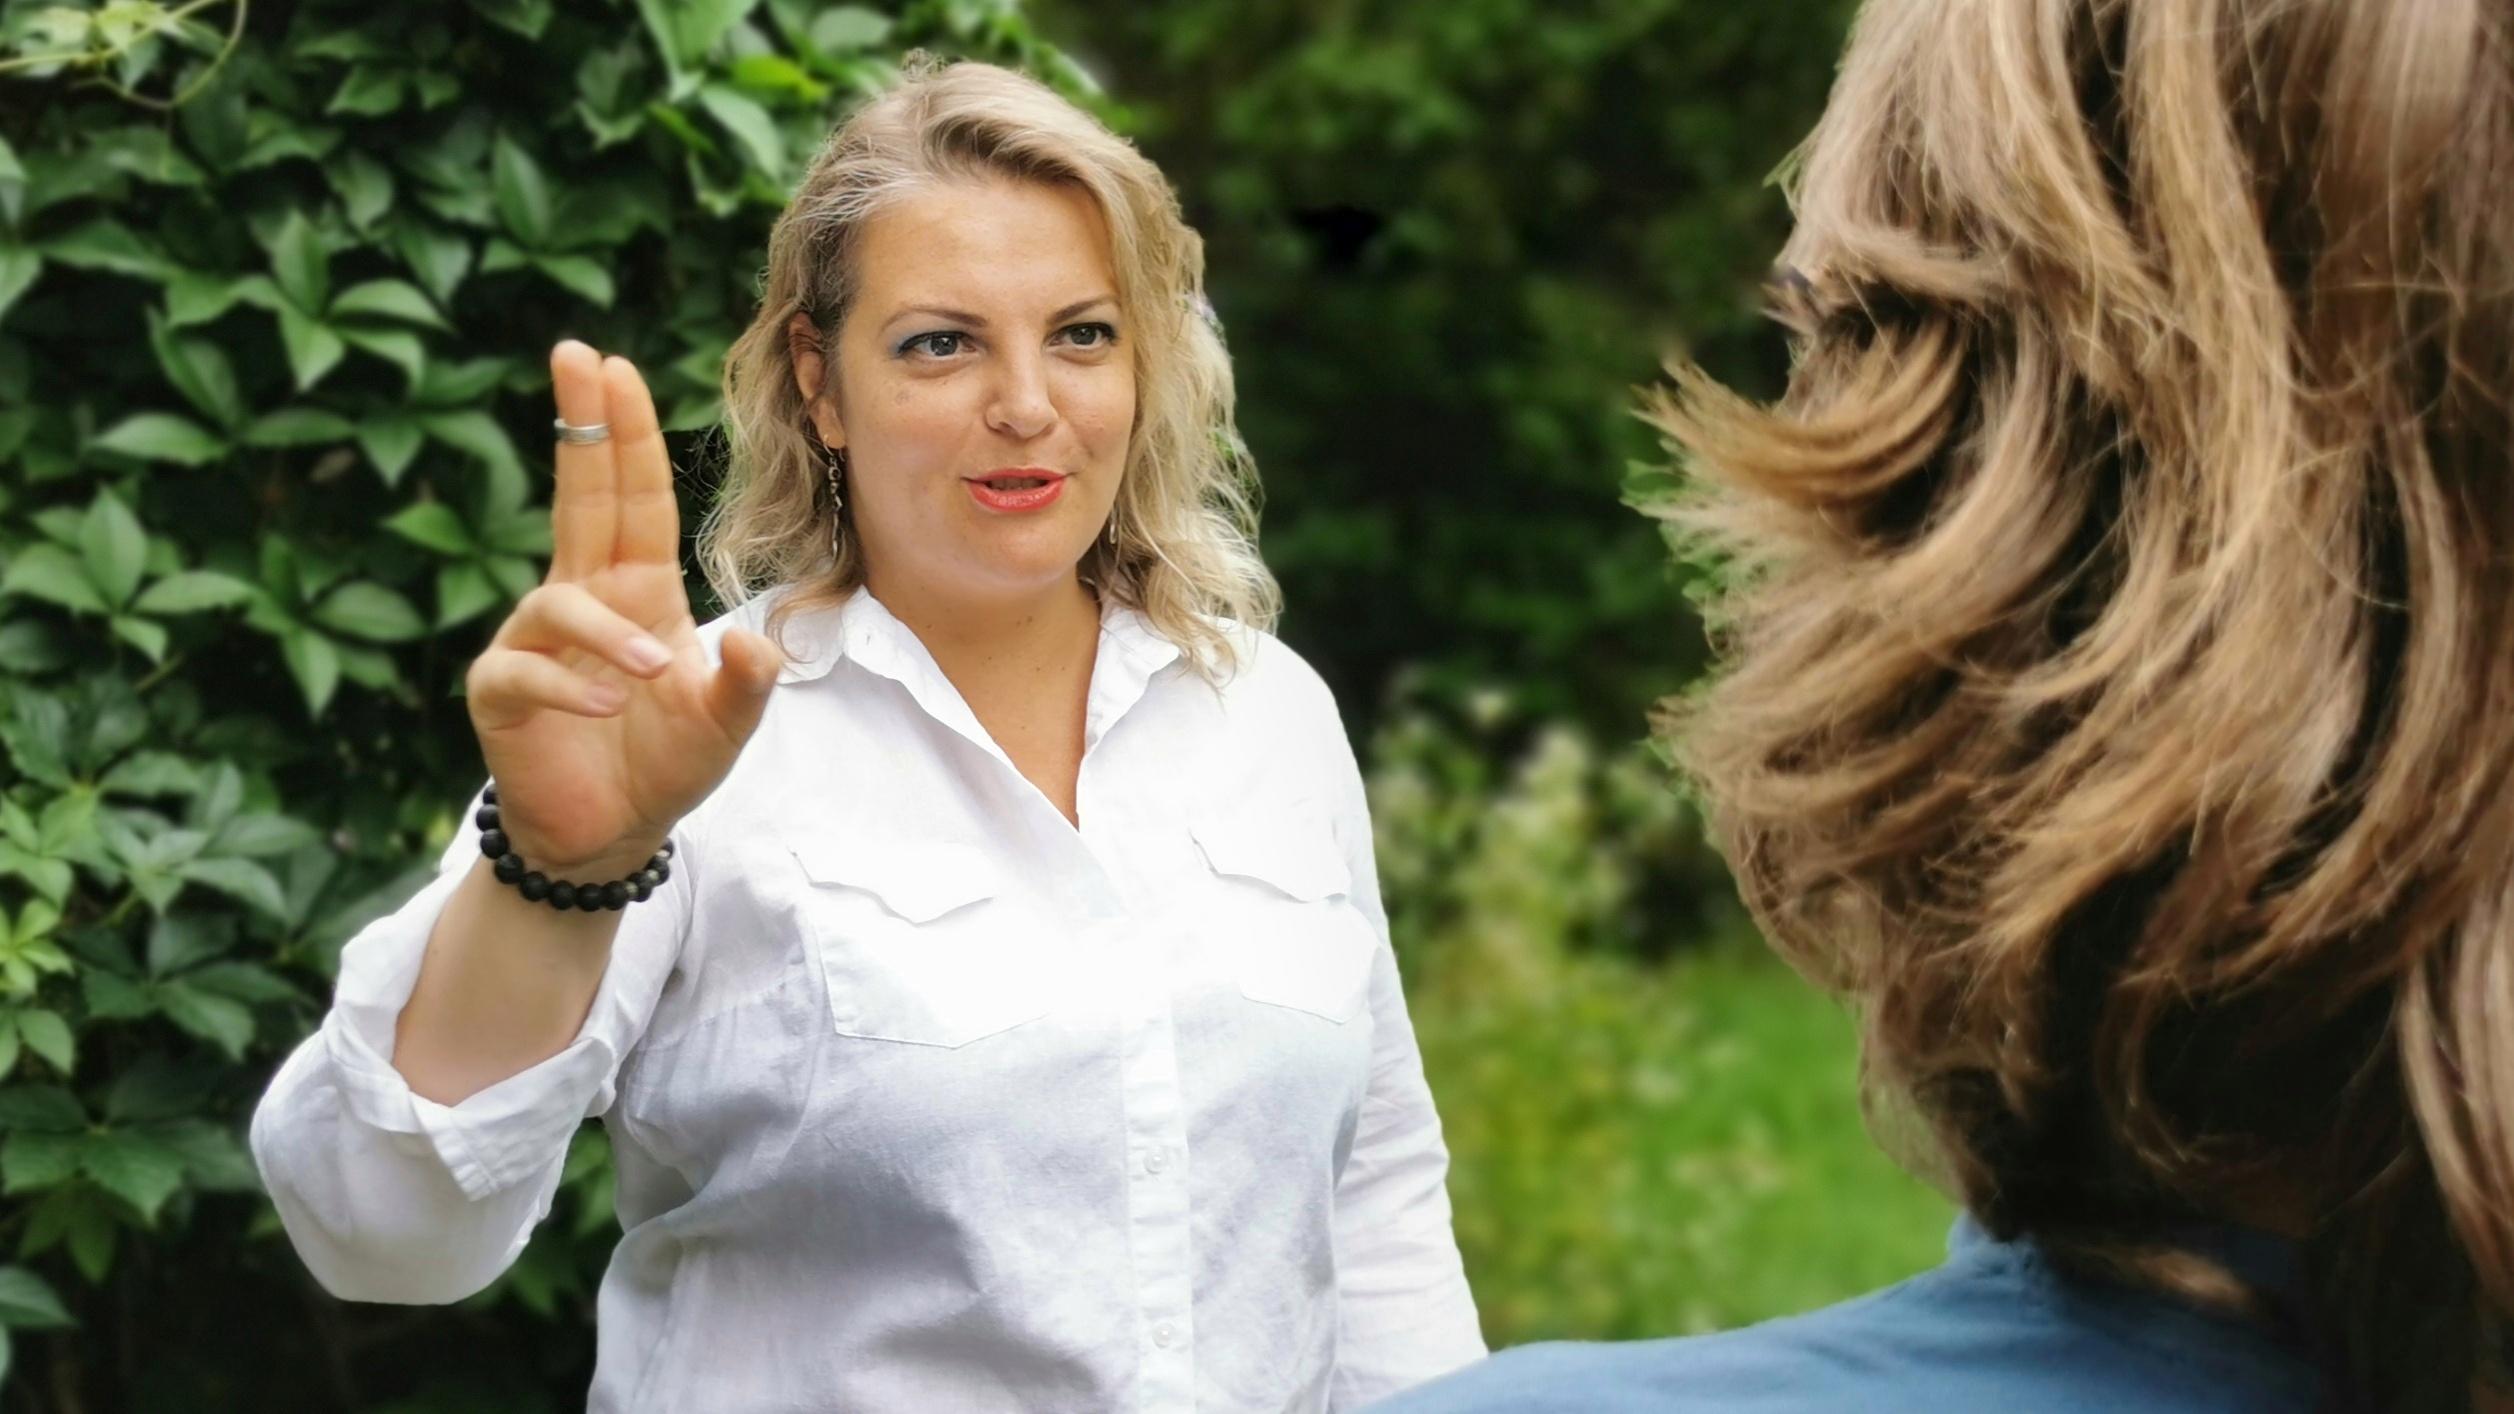 IEMT IAKT Integral Eye Movement Therapy Integrālā Acu Kustību Terapija healing, coaching, themomscoach, koučings